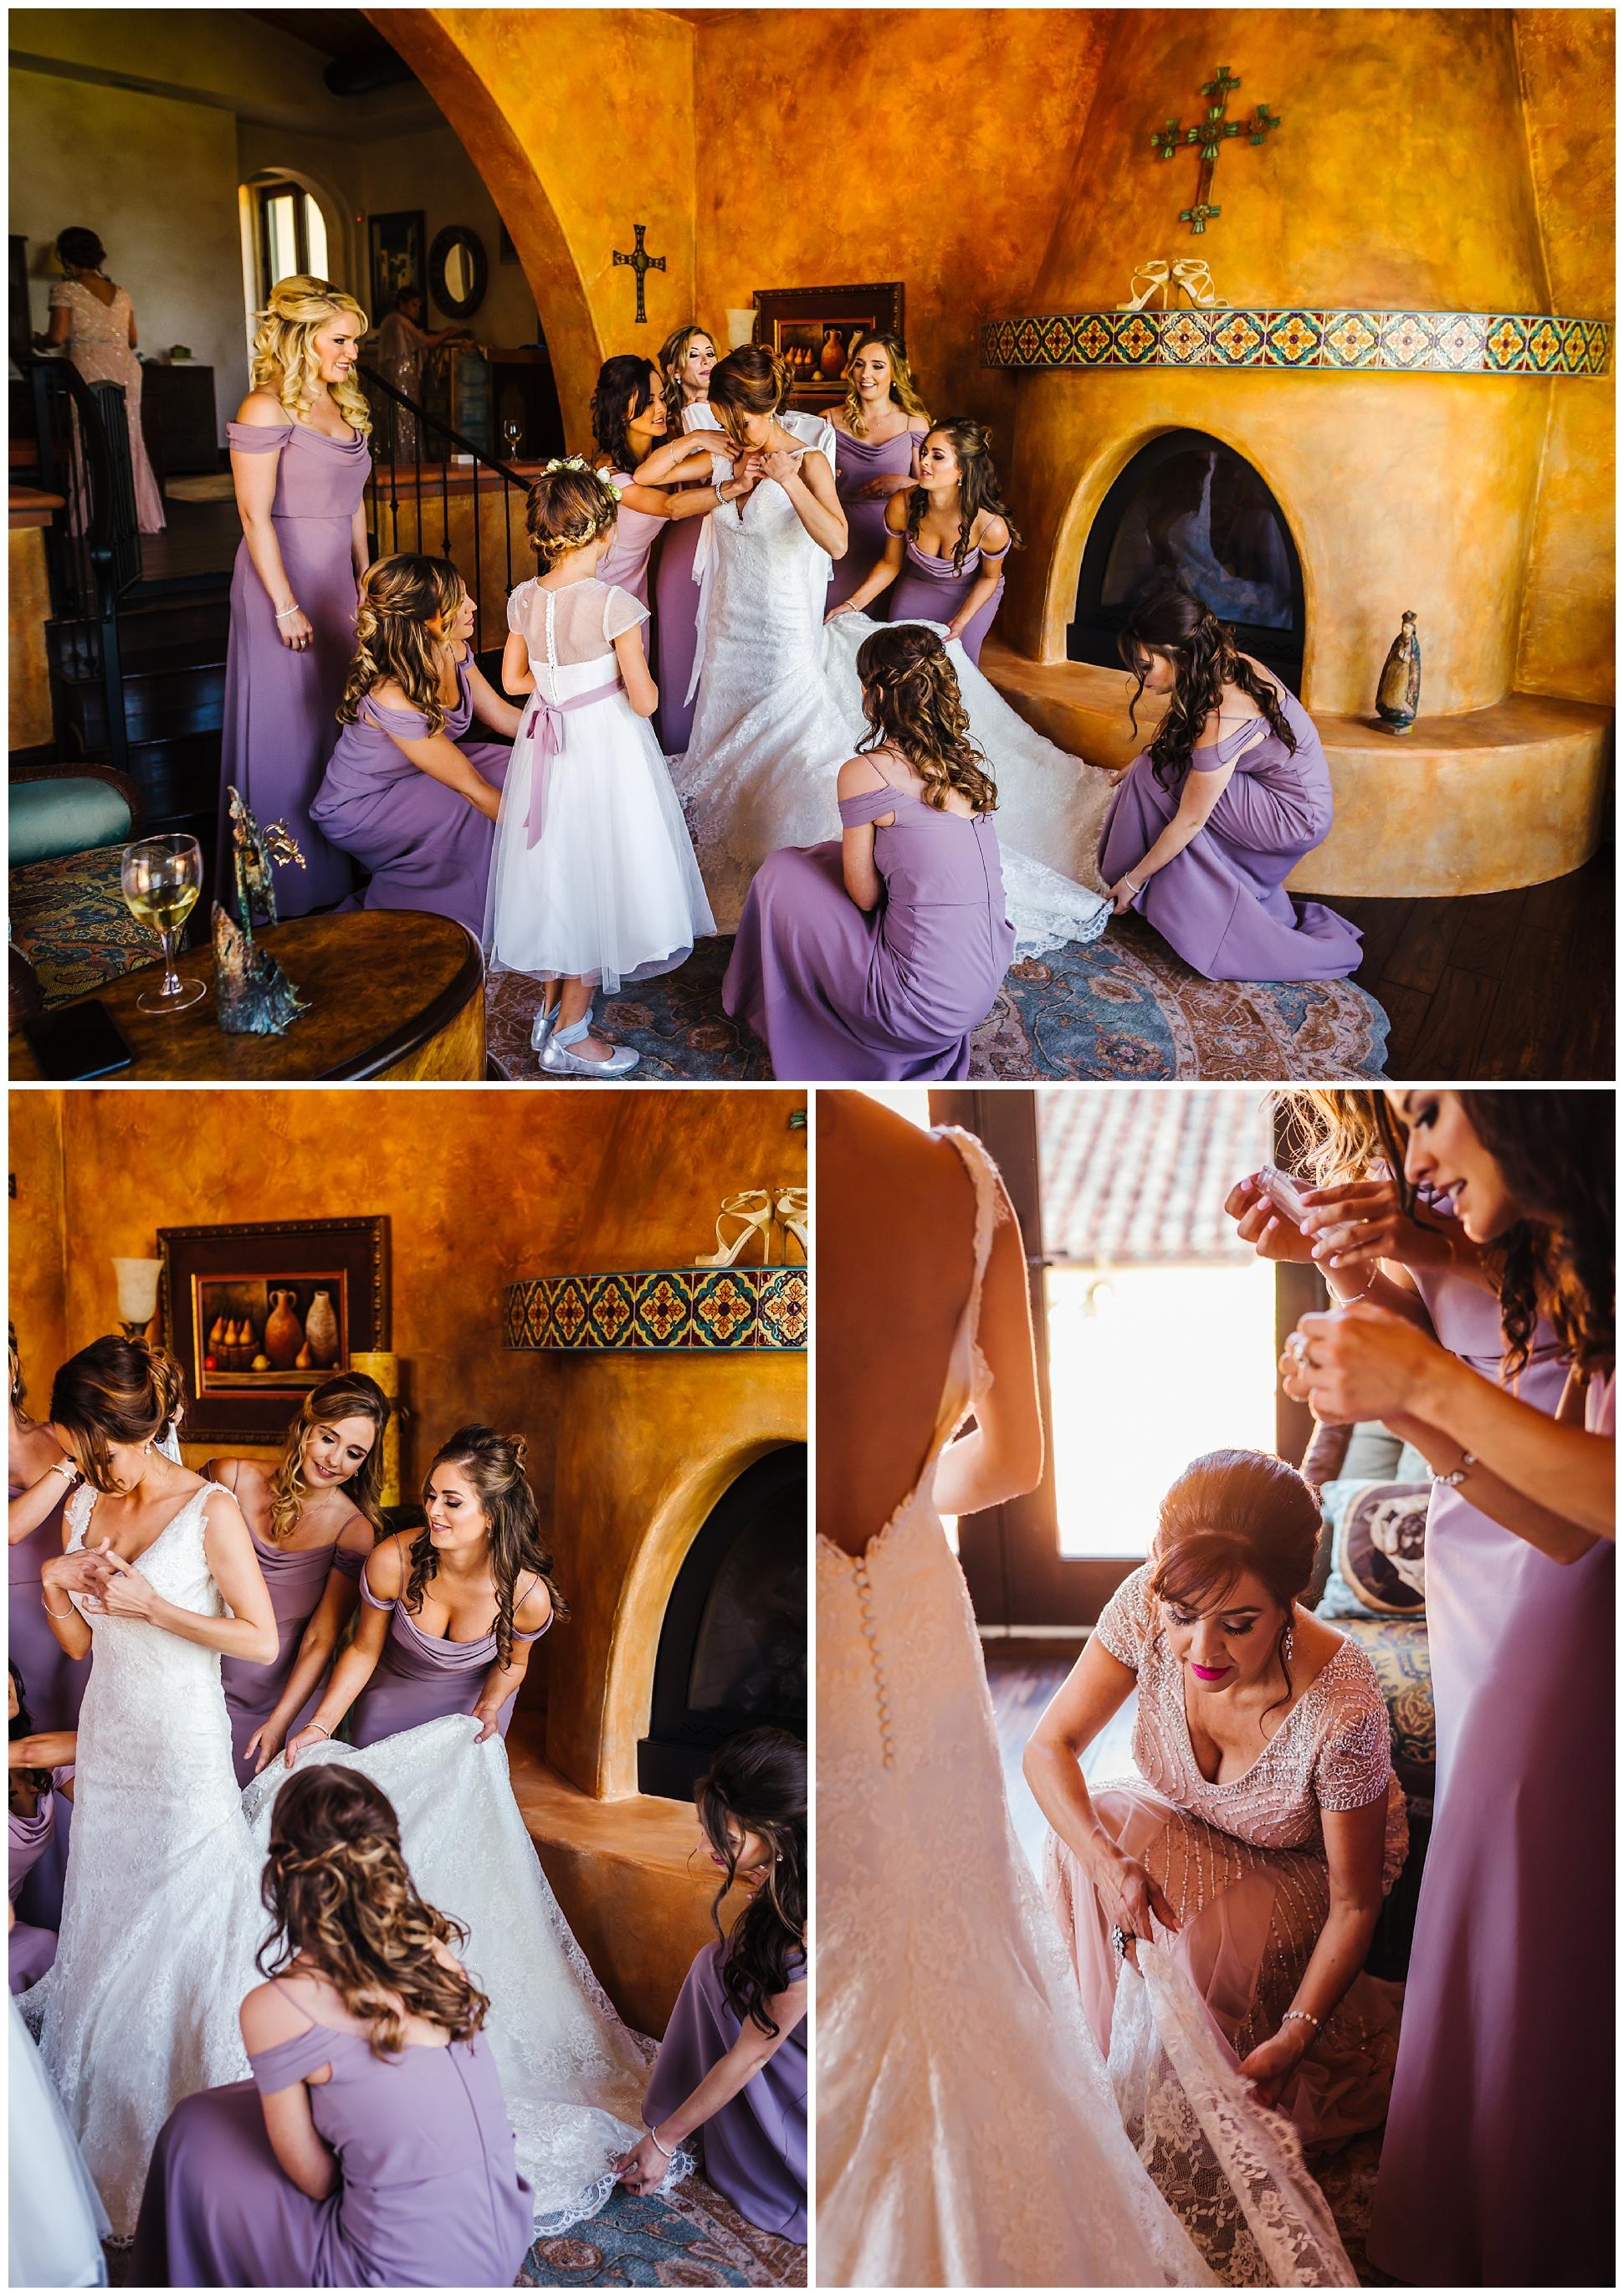 Tampa-luxury-wedding-photographer-mision-lago-private-estate_0008.jpg